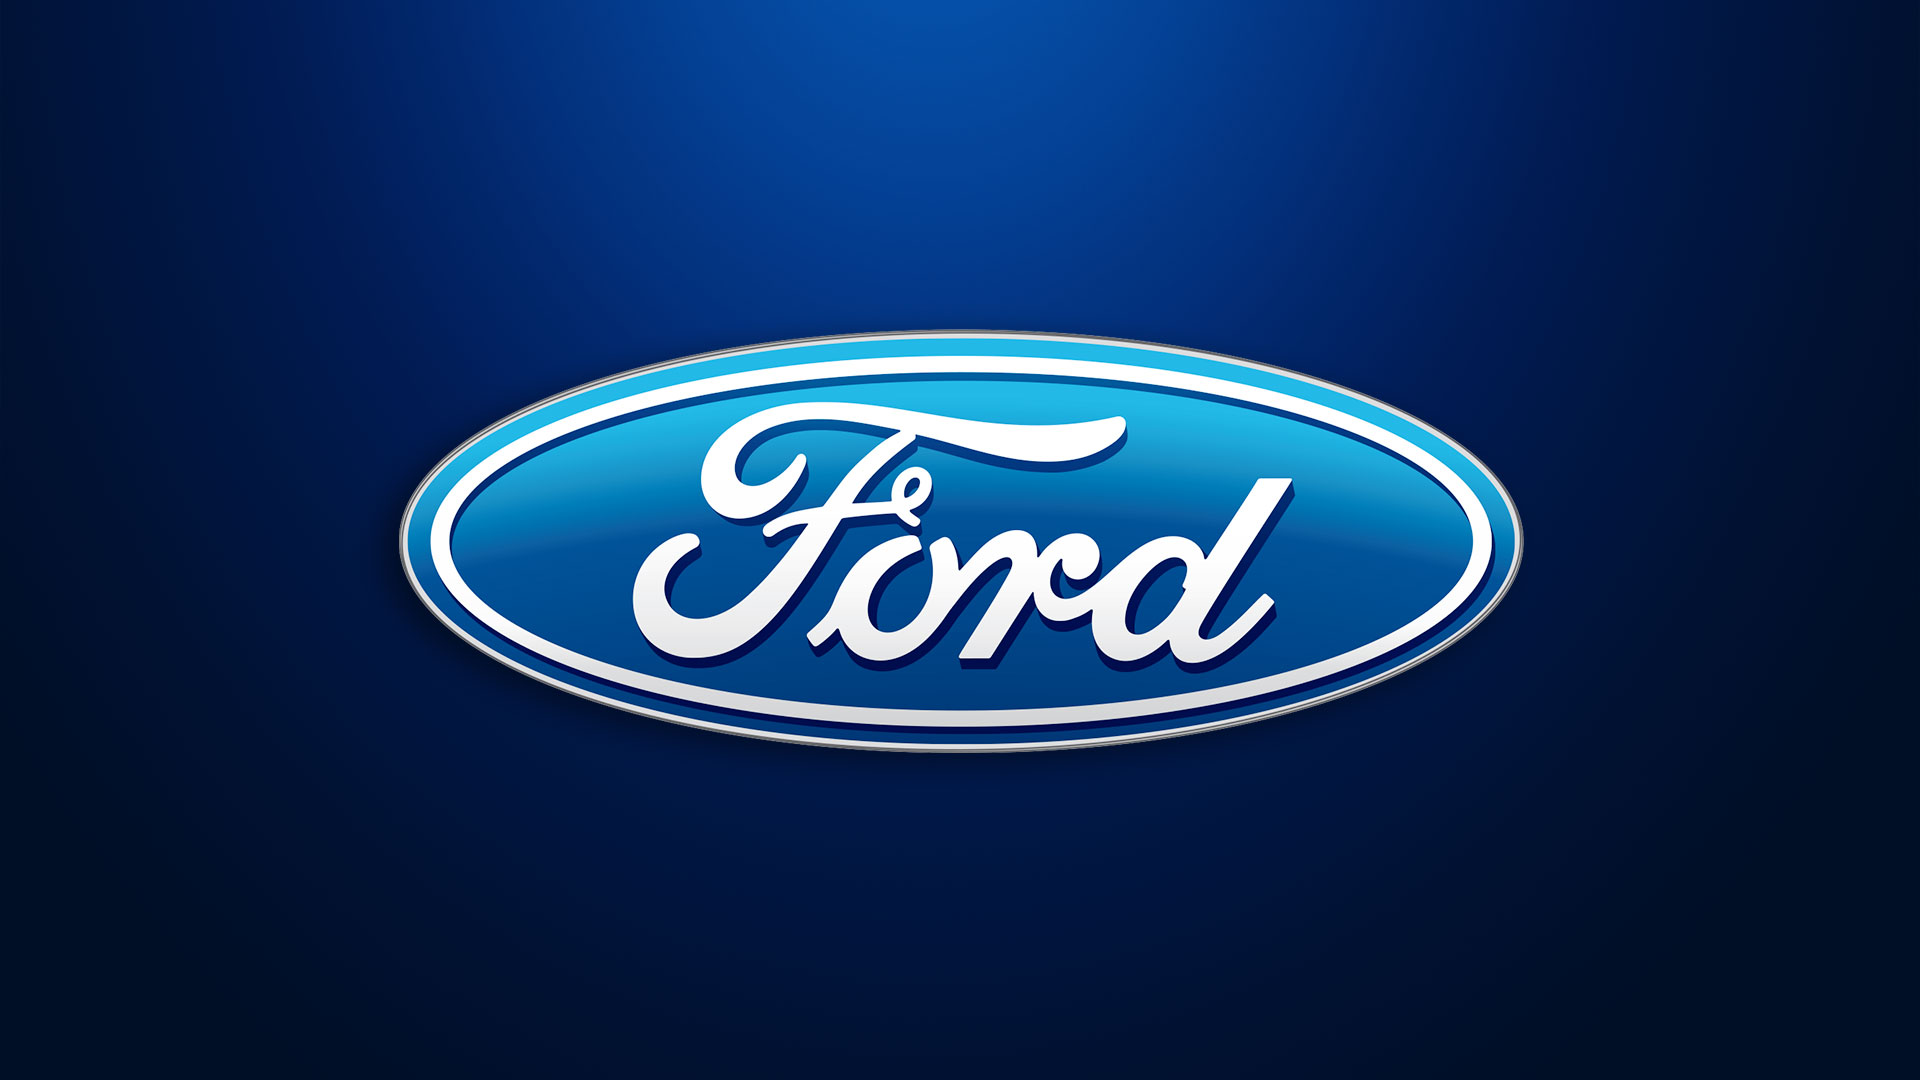 KELO Ford